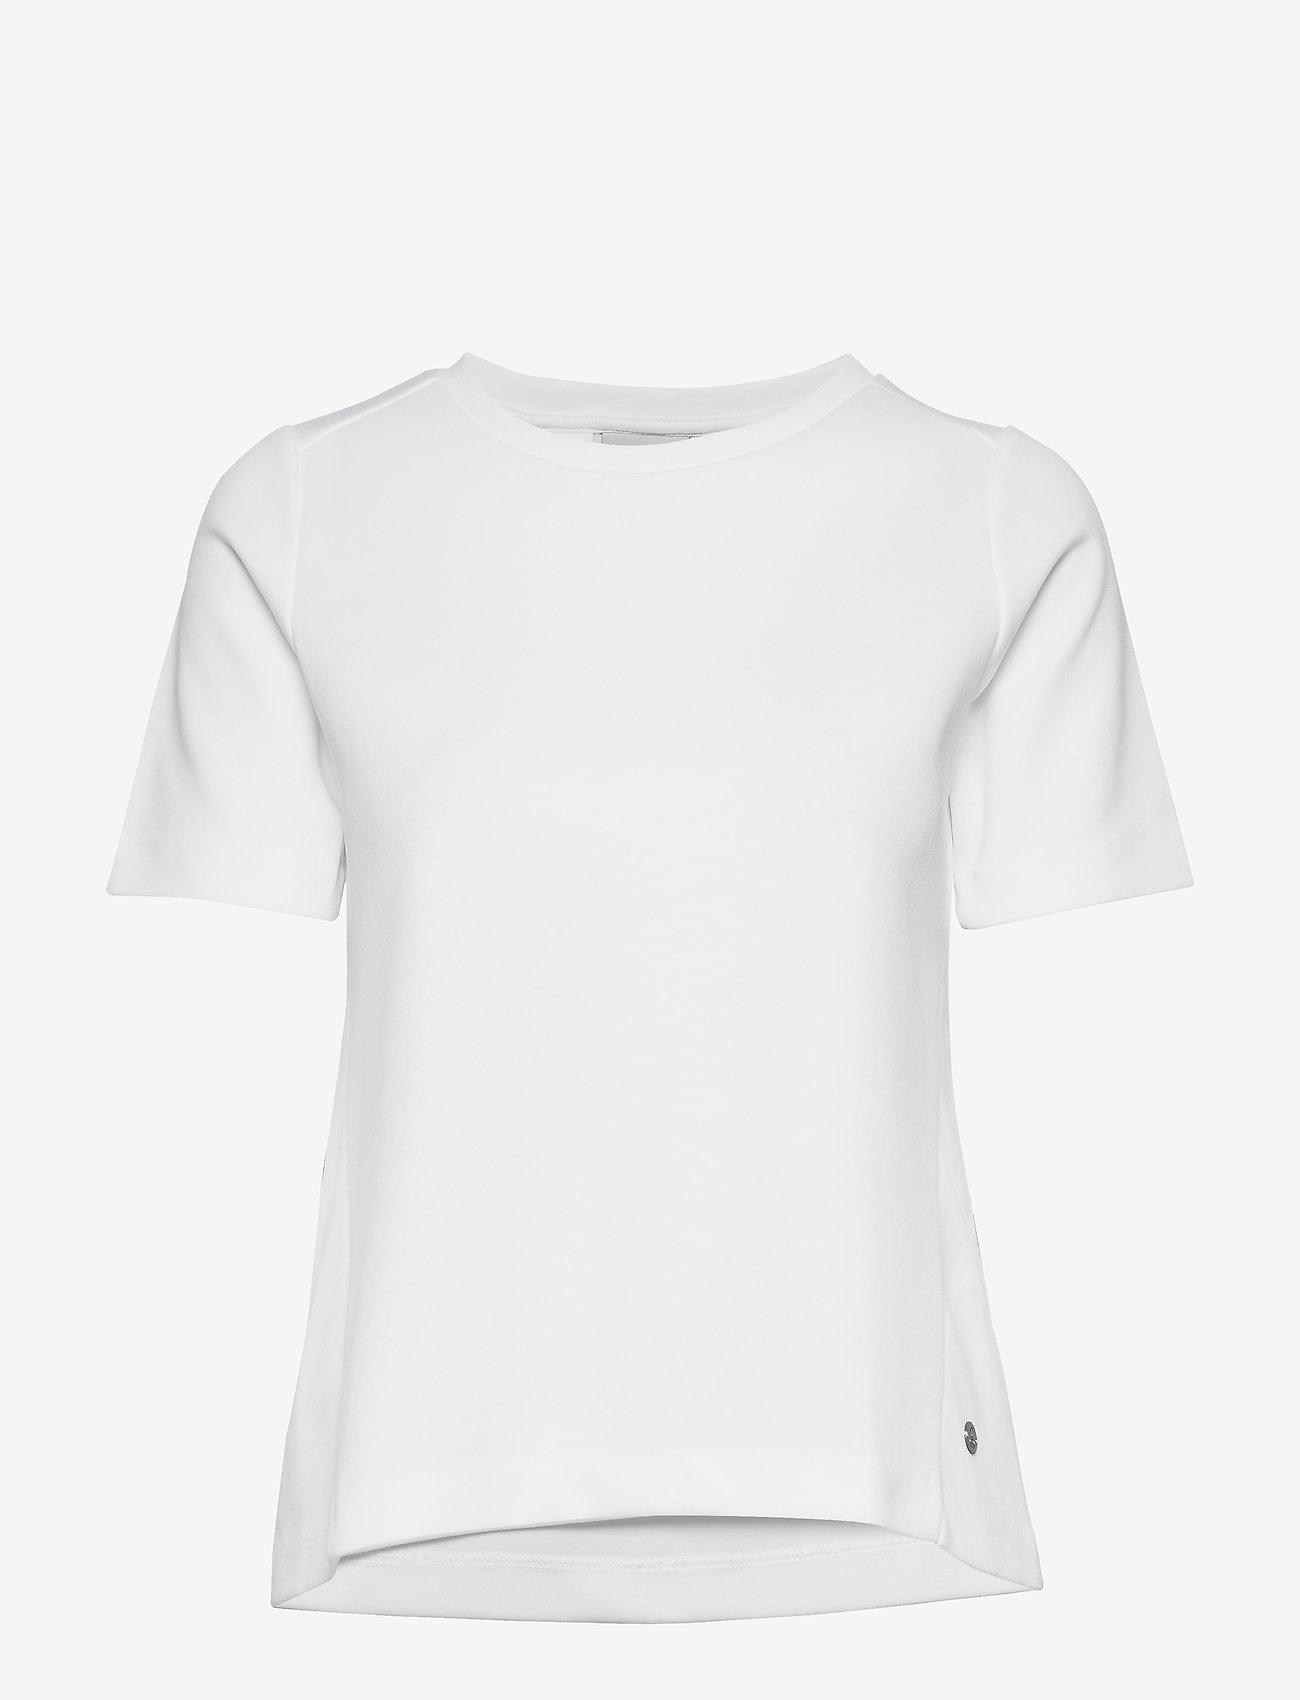 Sail Racing - W RACE SS CREWNECK - t-shirts - white - 0